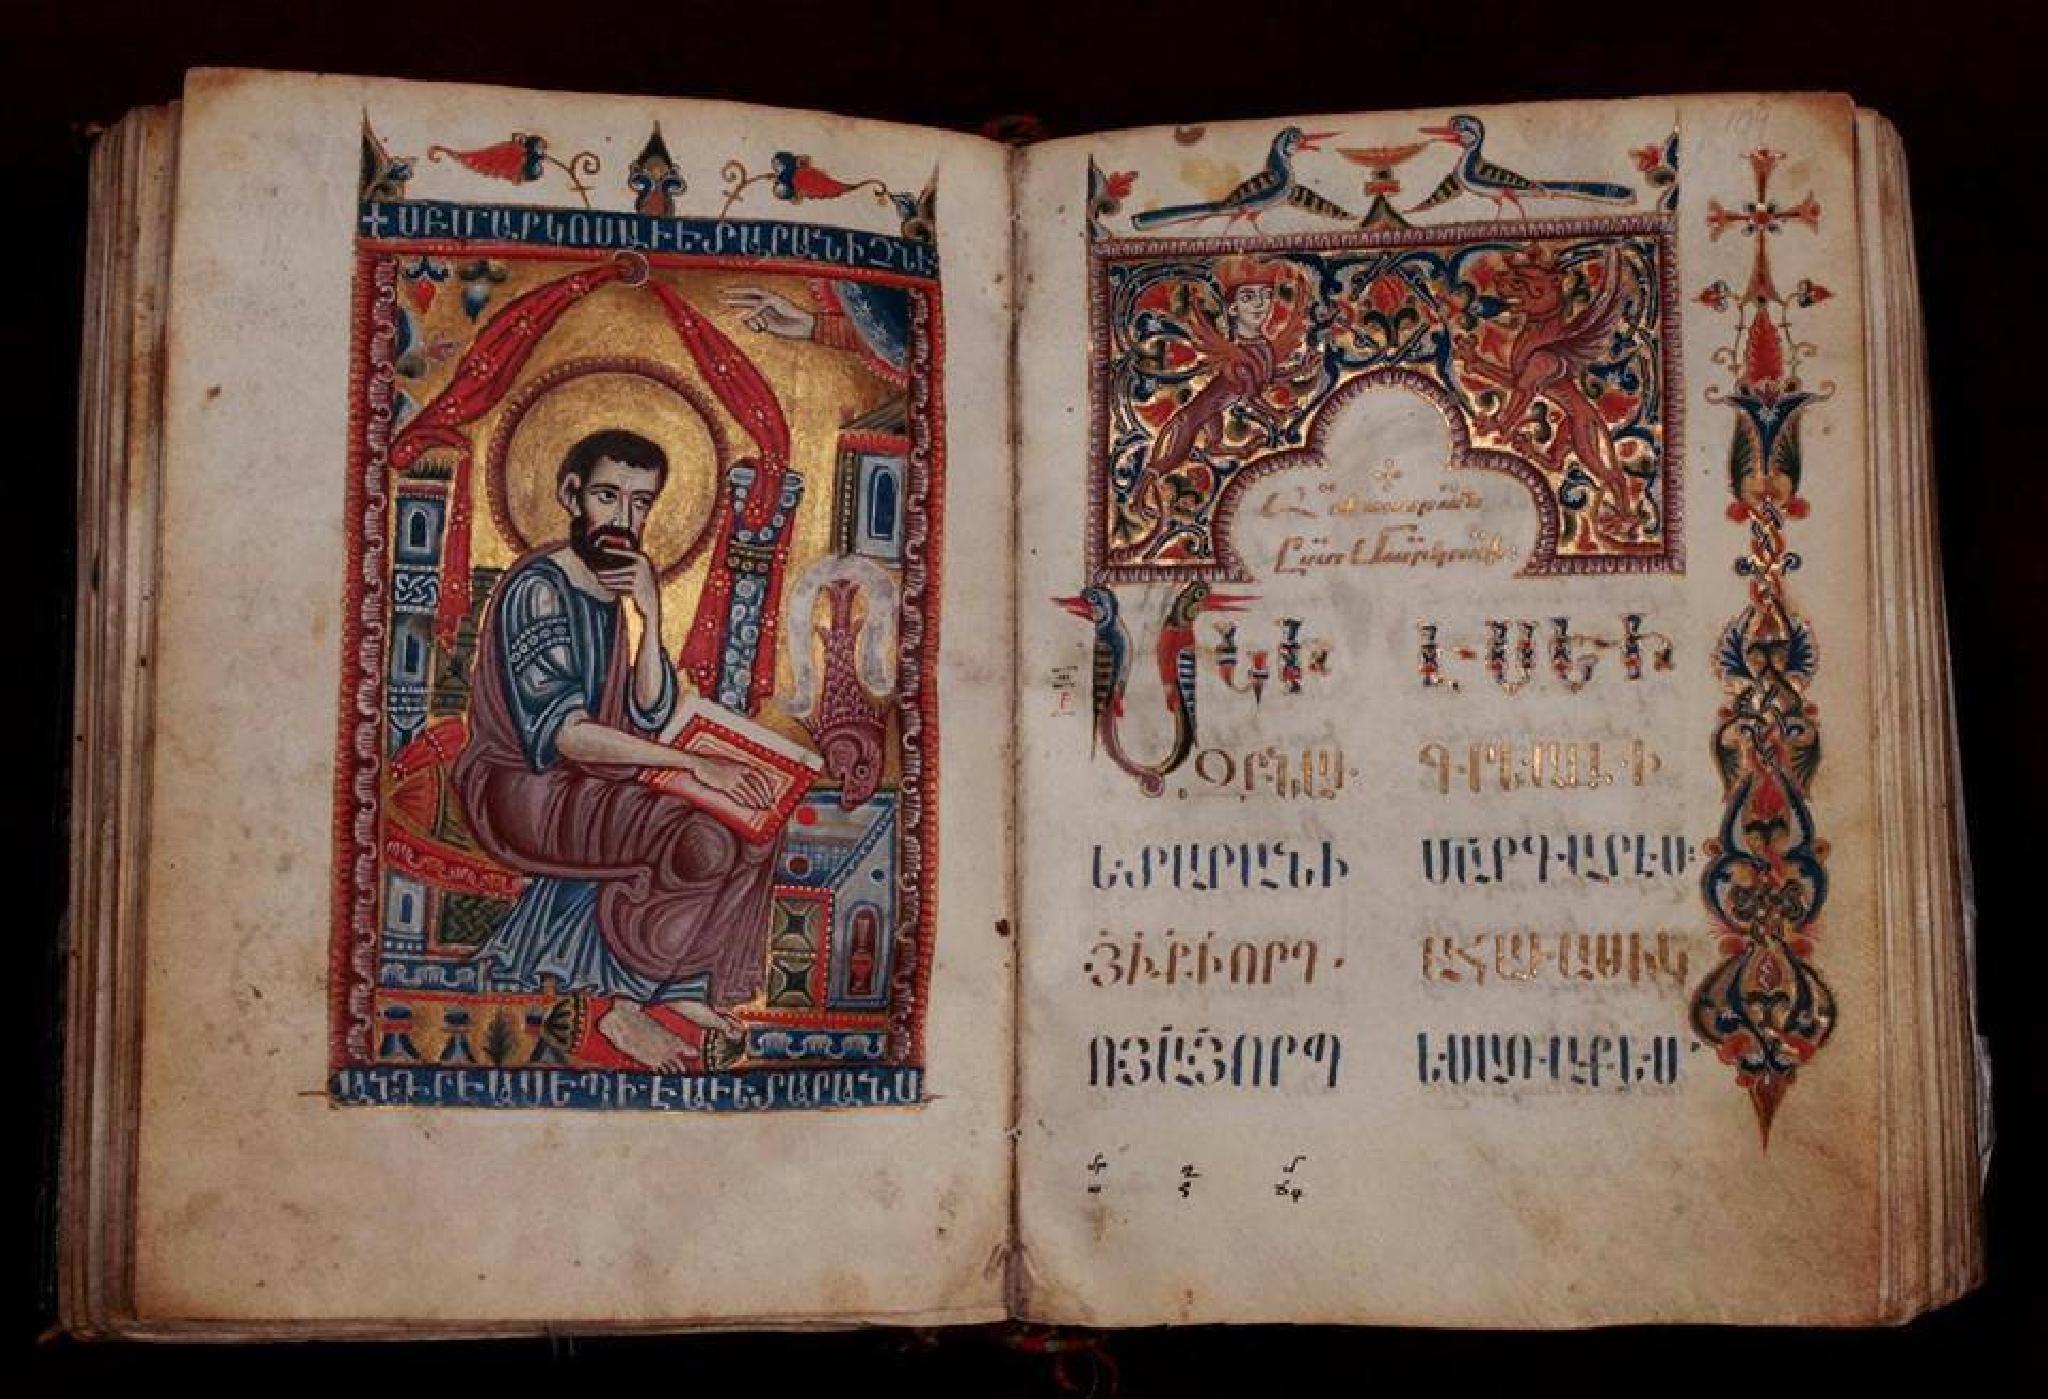 Մատենադարանի ձերագի Ավետարան 13 դար Matenadaran Gospel age 13 by yurhanartharutyunyan